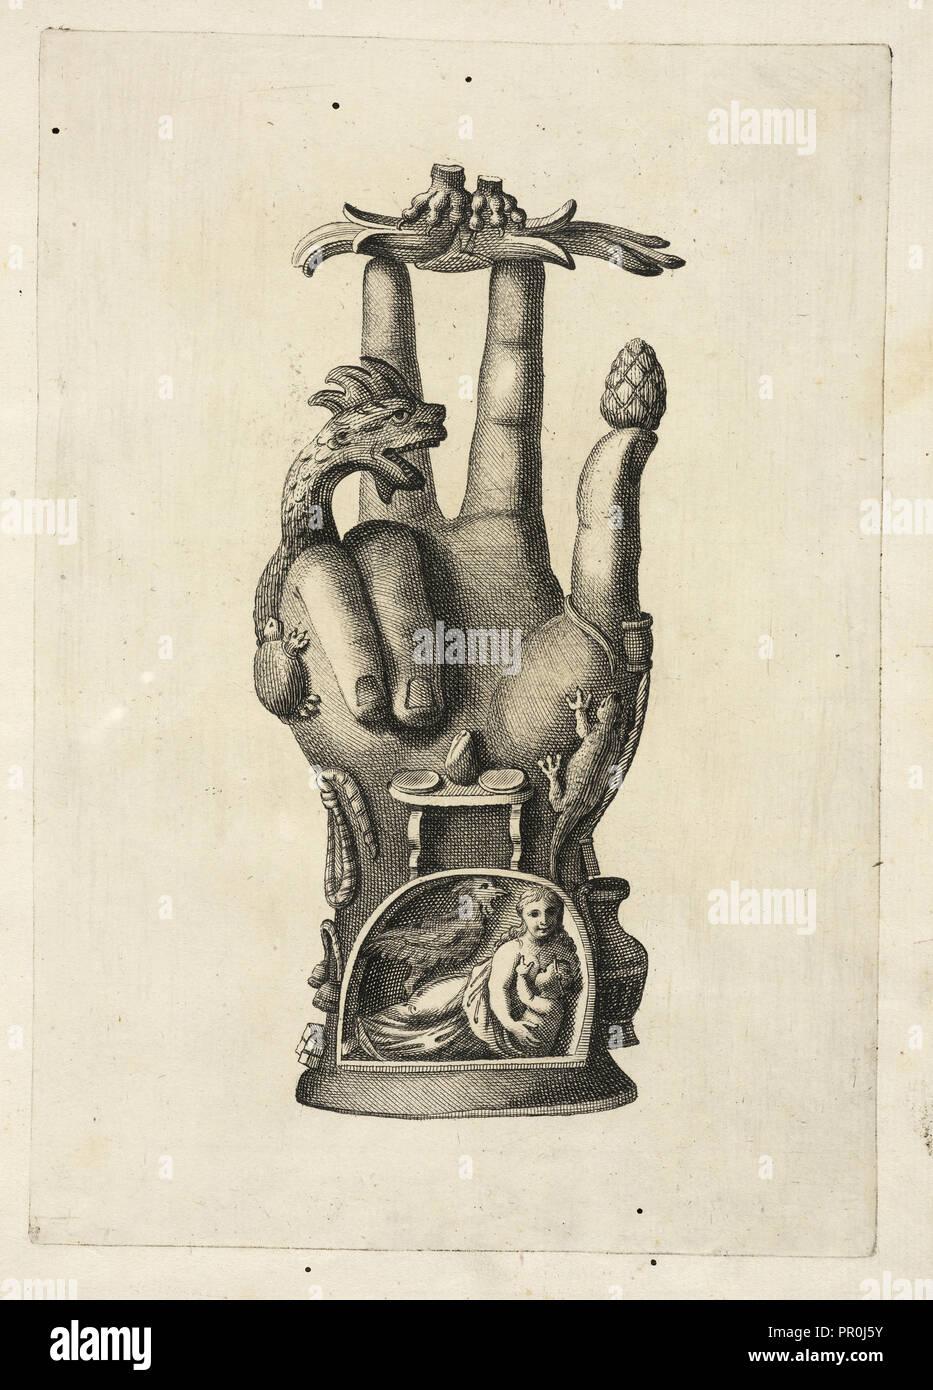 Mano di bronzo, detta Alcuni monumenti Pantea, del Museo Carrafa, Daniele, Francesco, 1740-1812, grabado, aguafuerte 1778 Imagen De Stock